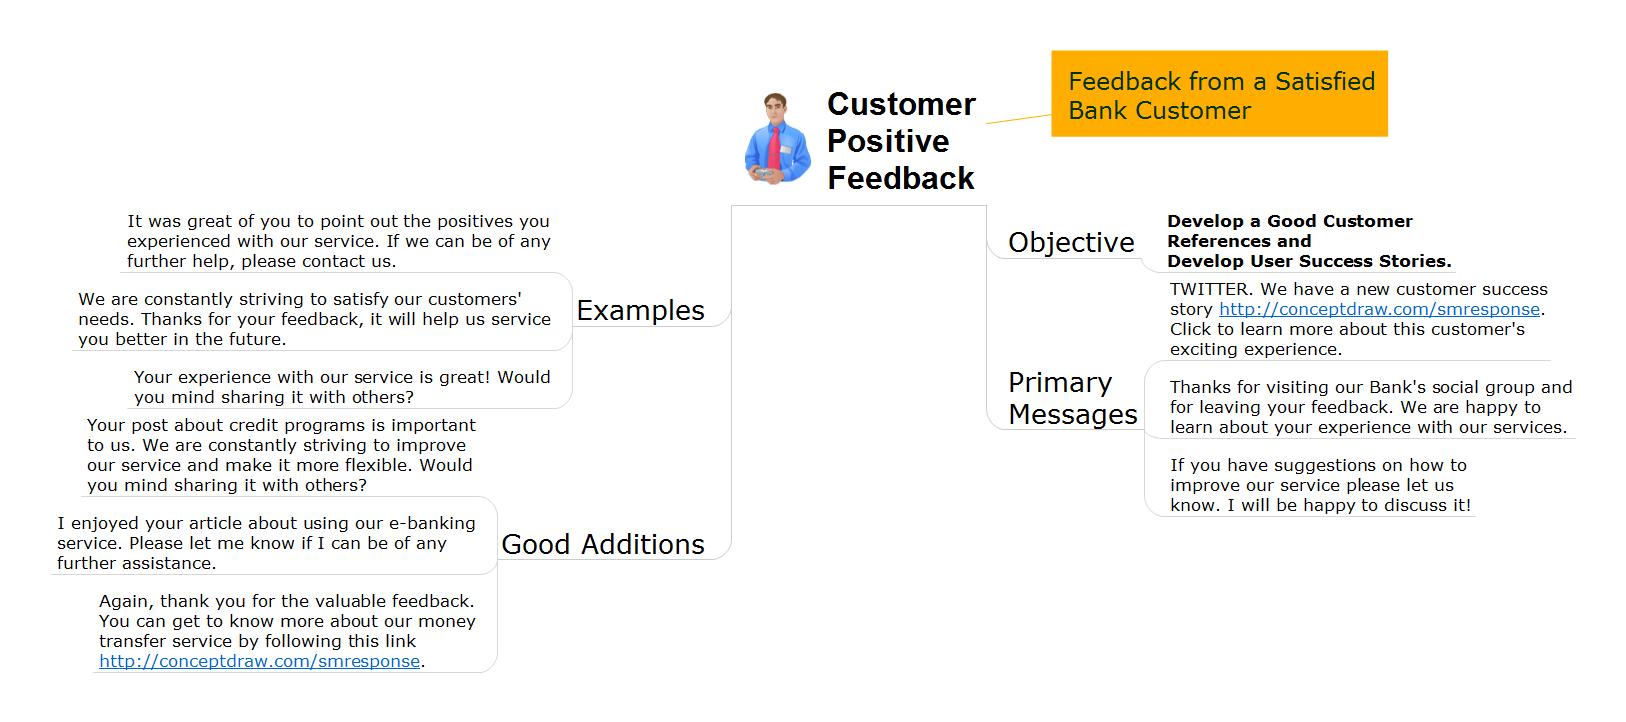 Action mind map - Bank customer positive feedback